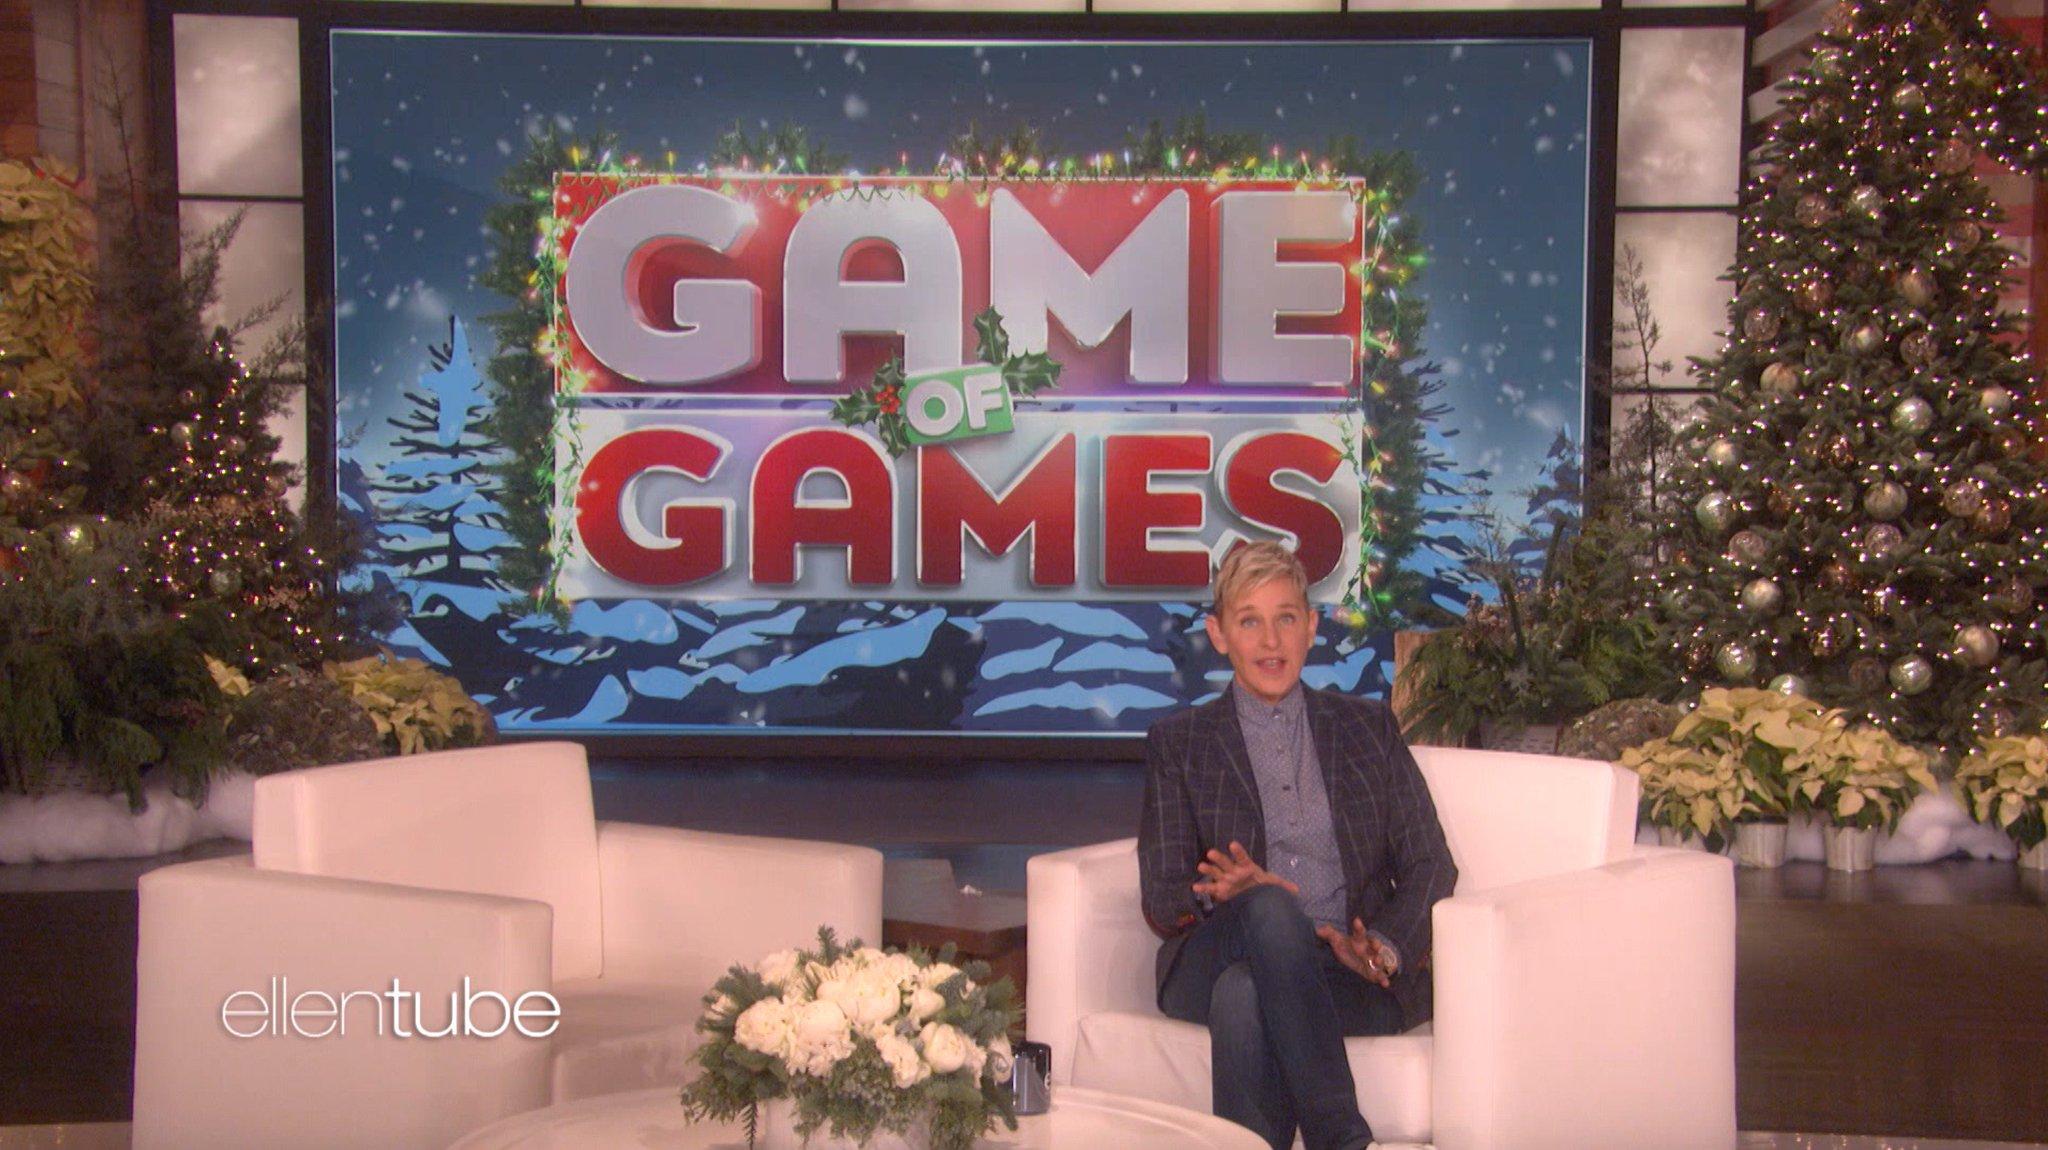 Don't miss my #GameofGames Holiday Spectacular, tonight! @NBC https://t.co/dIPdvXFKsu